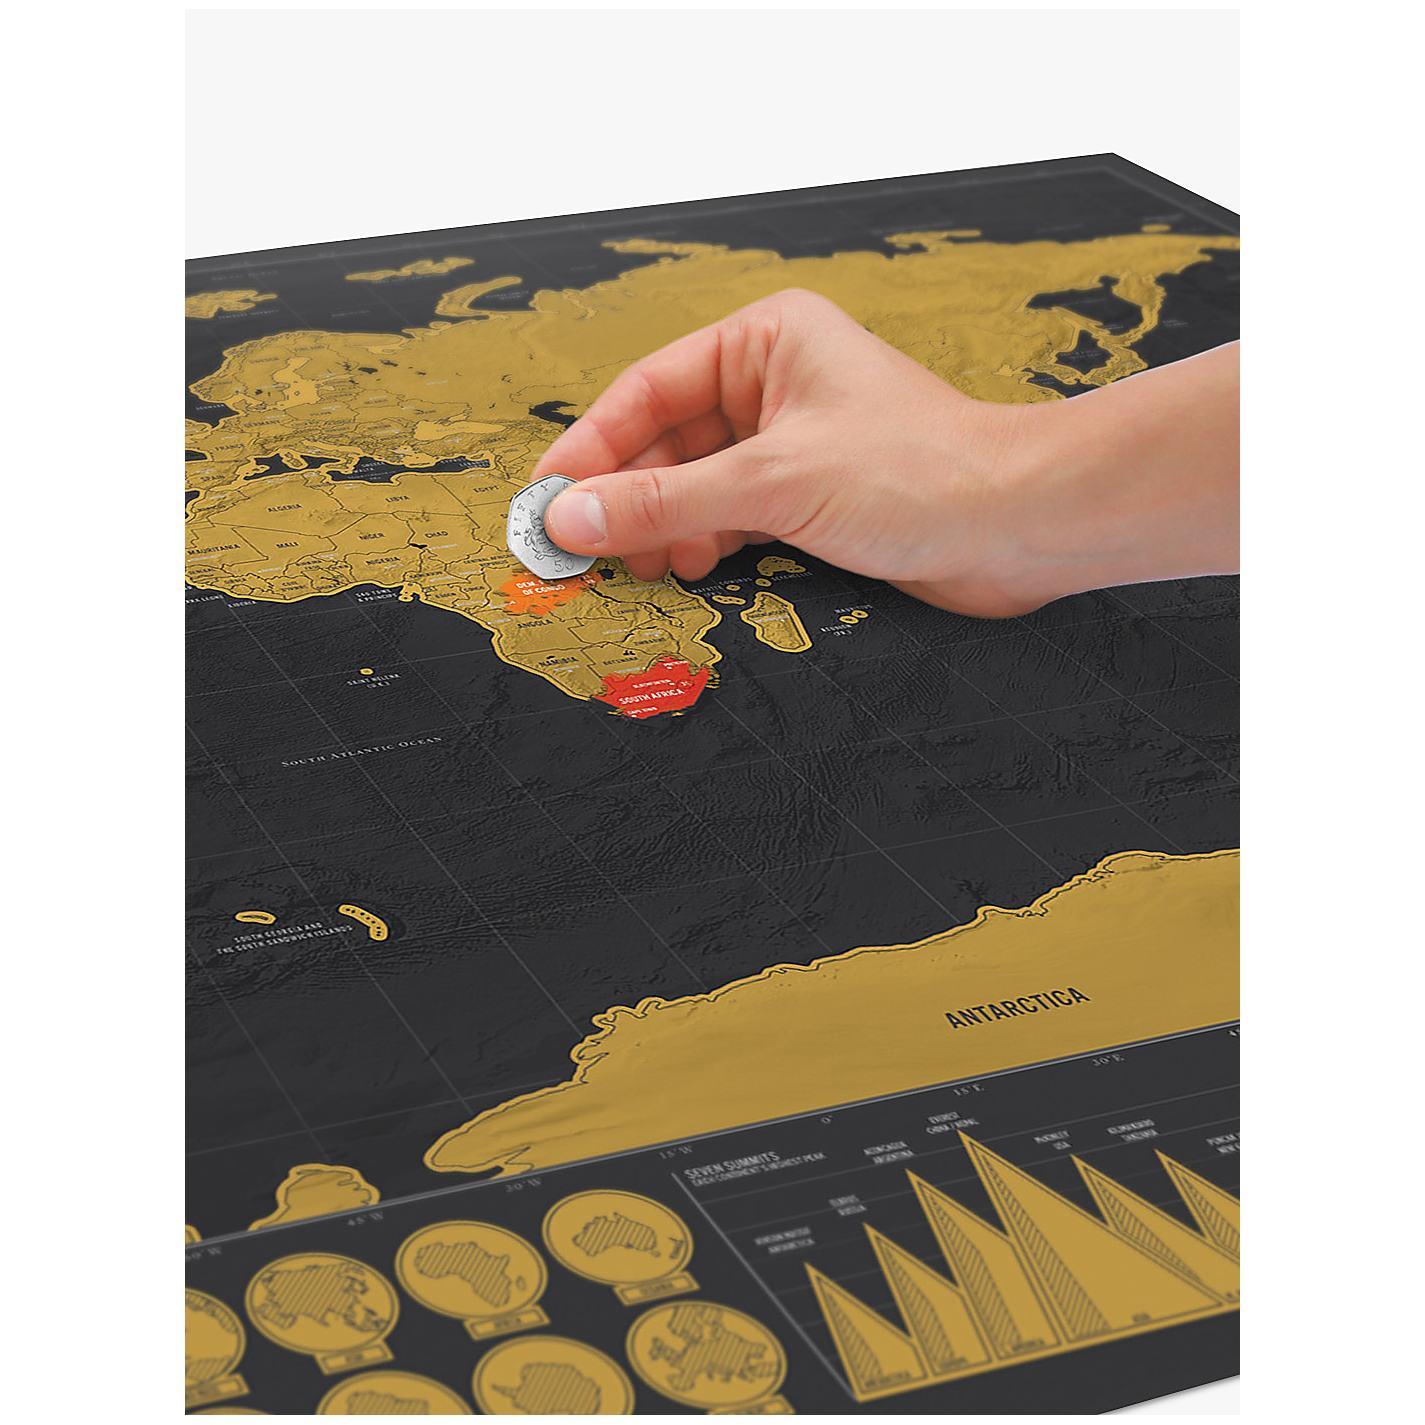 Buy Luckies Deluxe Scratch Map H X Wcm John Lewis - Scratch world map us manaufacturuer